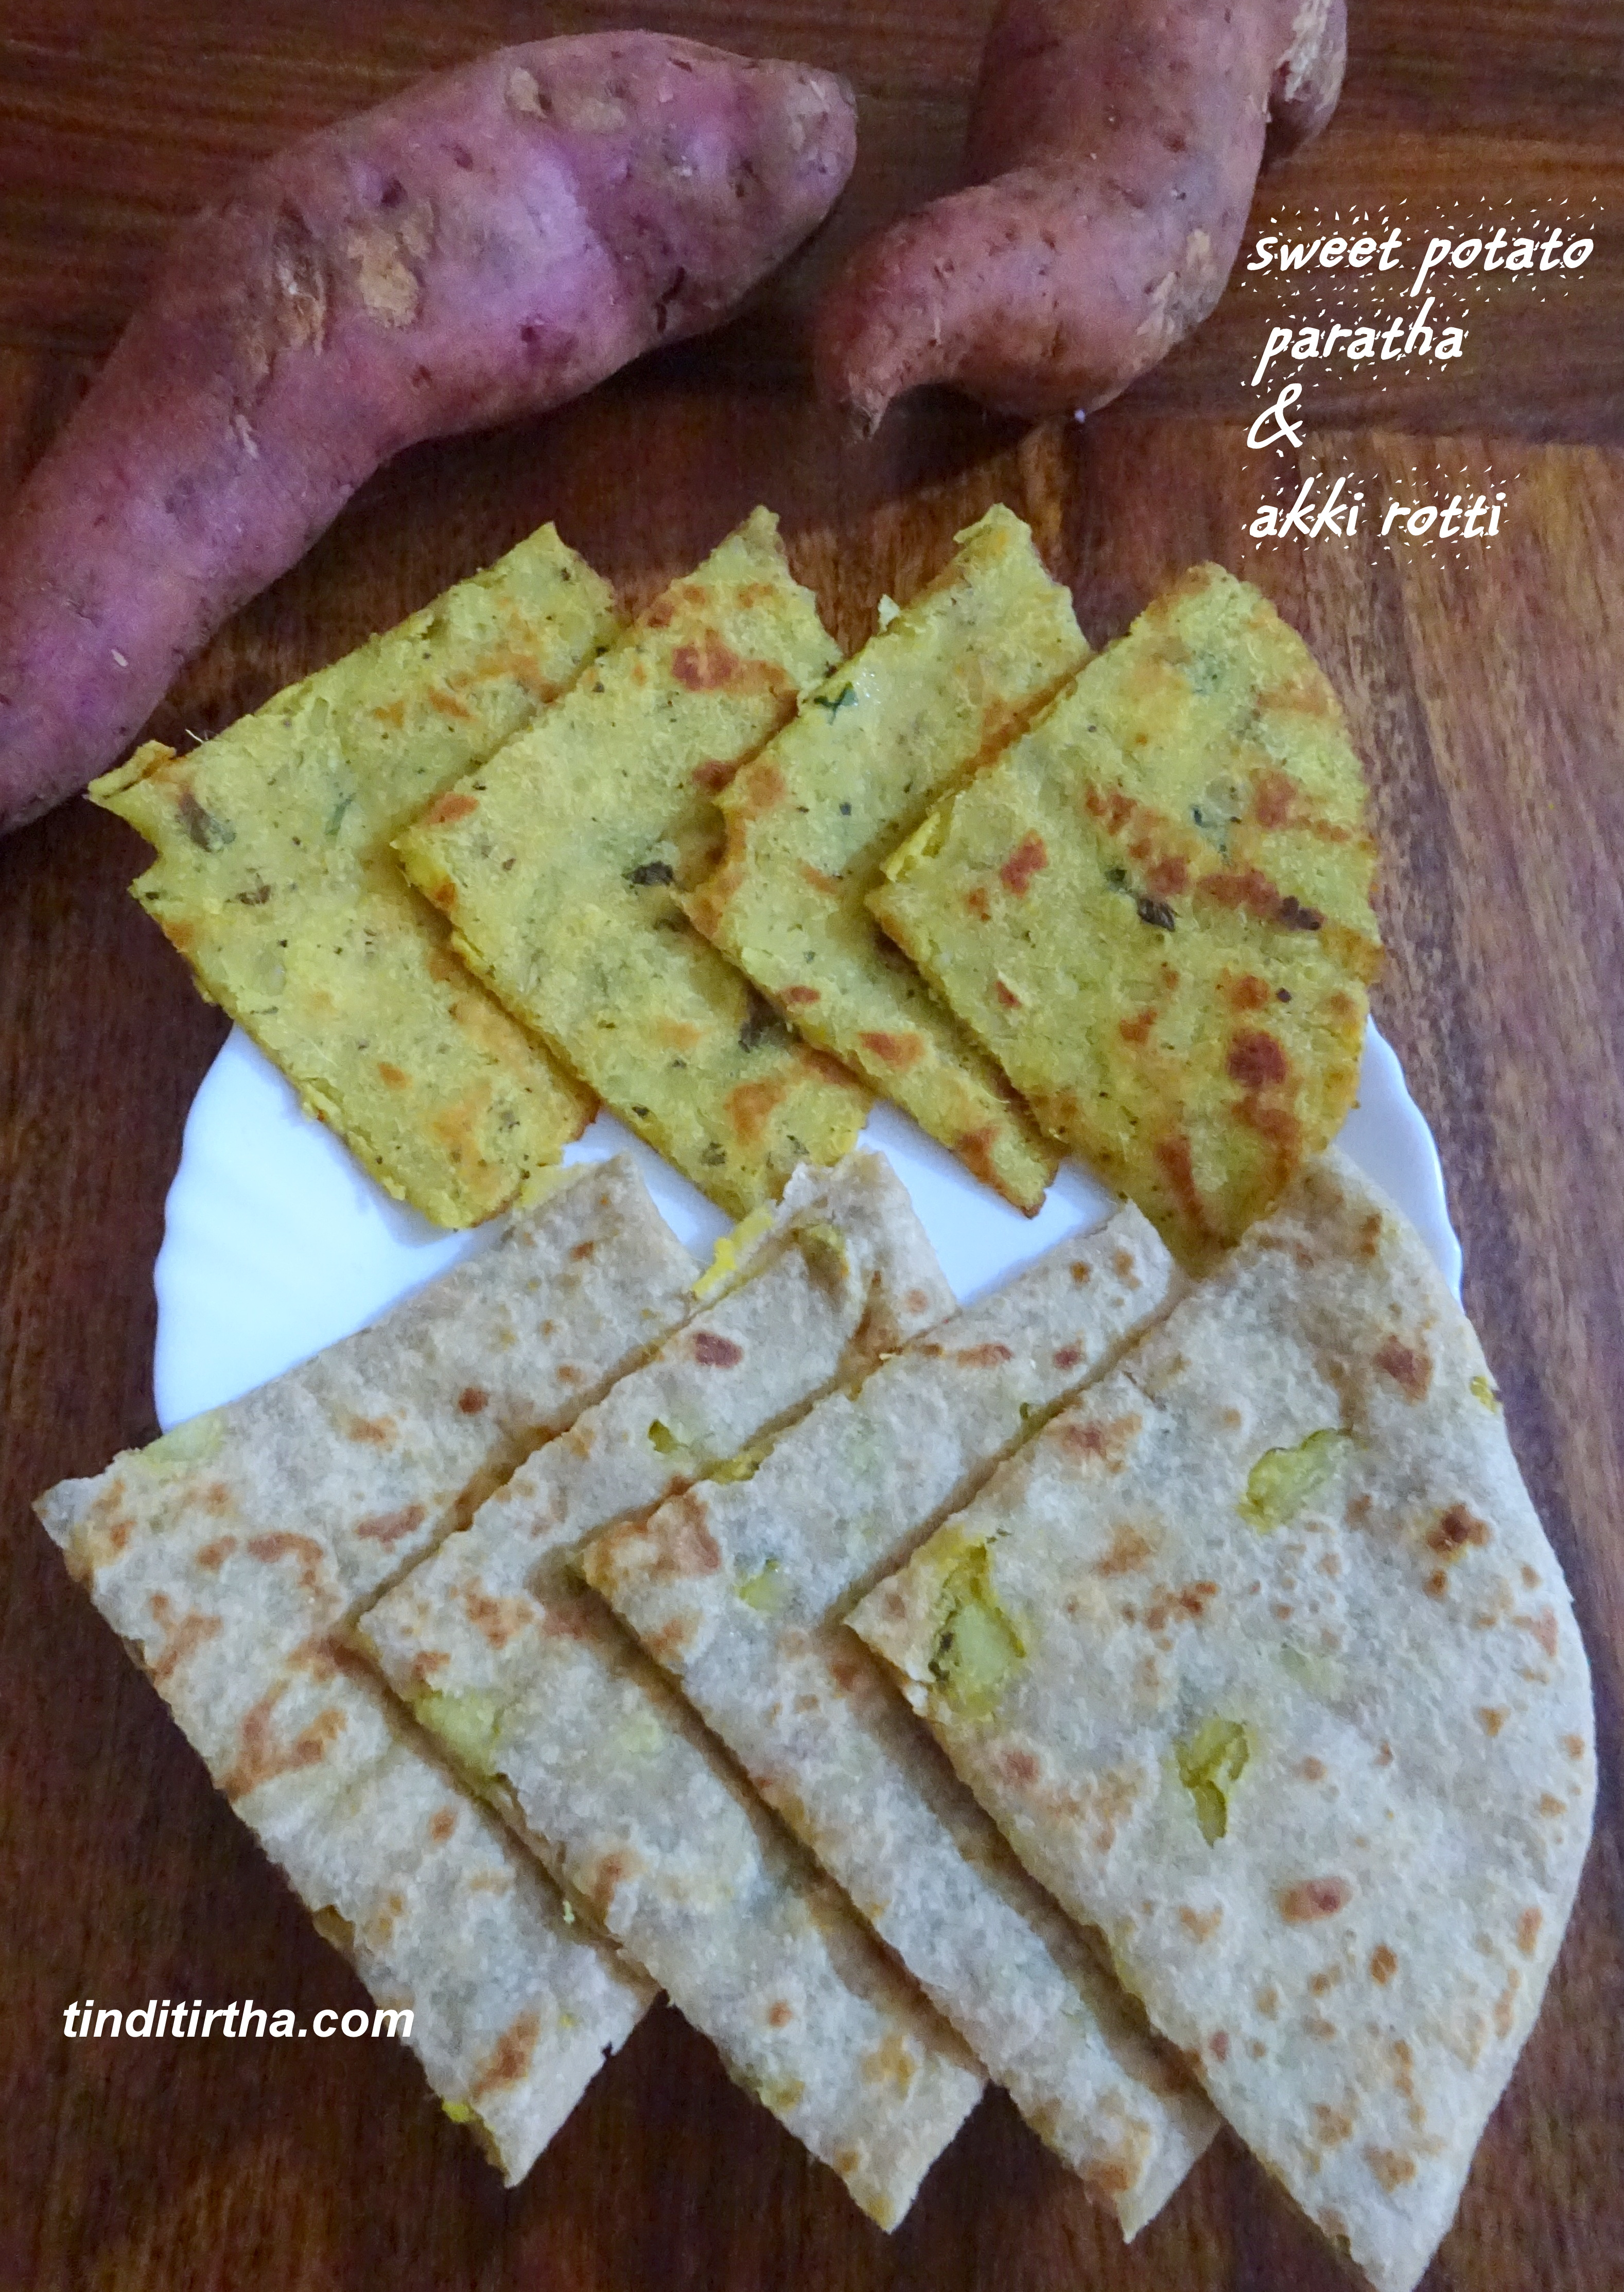 SWEET POTATO/SIHI GENASINA PARATHA using whole wheat flour